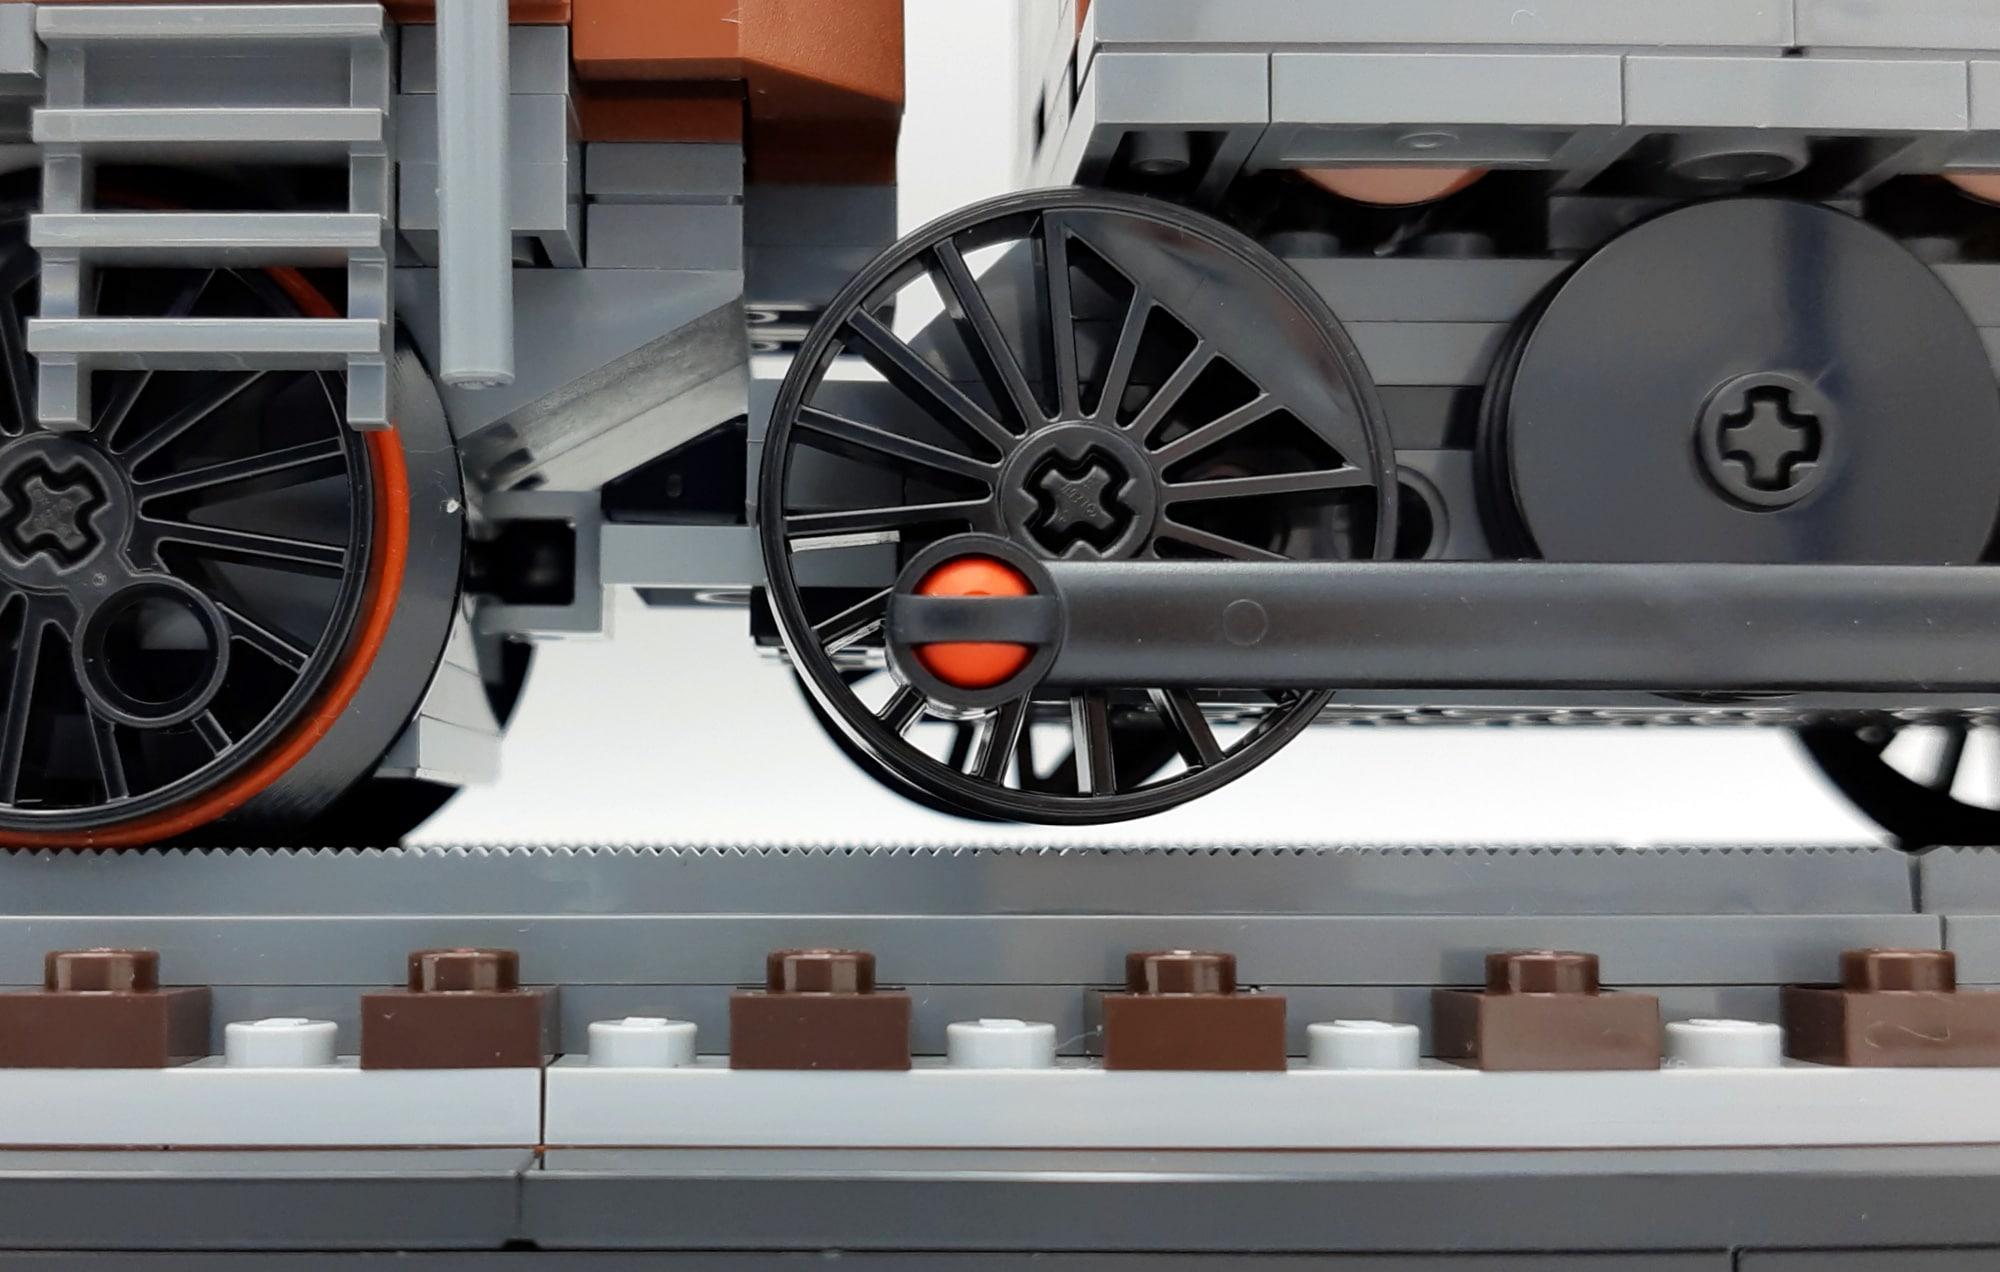 LEGO 10277 Krokodil Lokomotive - Detail schwebendes Rad